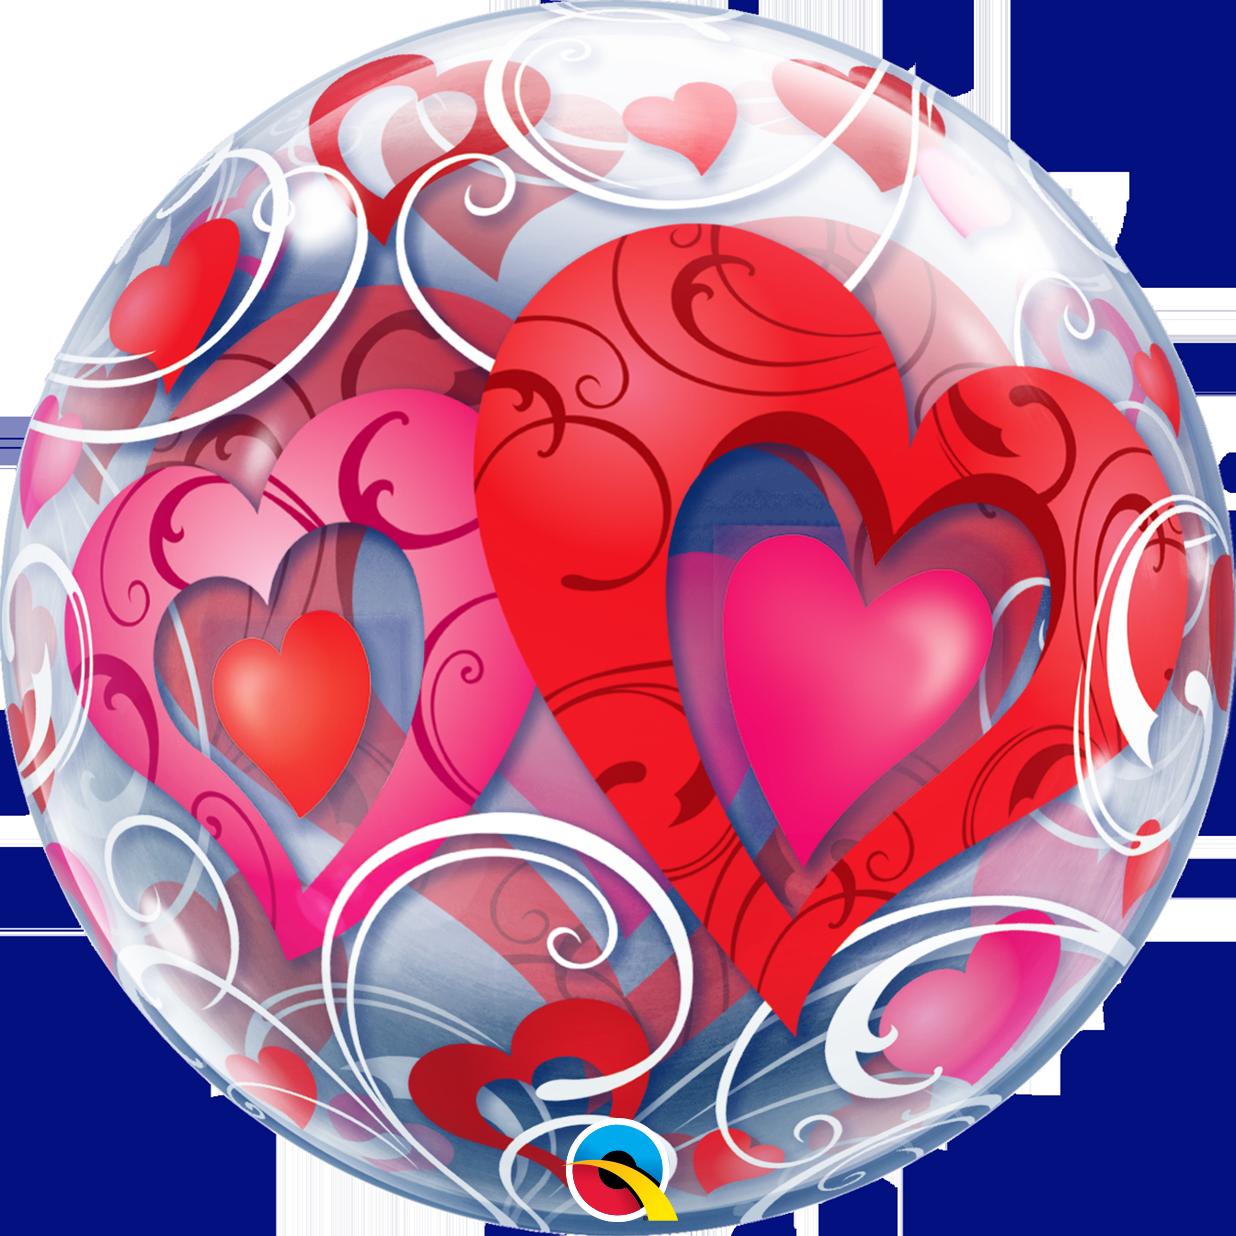 Heart filigree clipart jpg freeuse library I Love You Heart Bubble Balloon Bouquet | onlineweddingstore jpg freeuse library